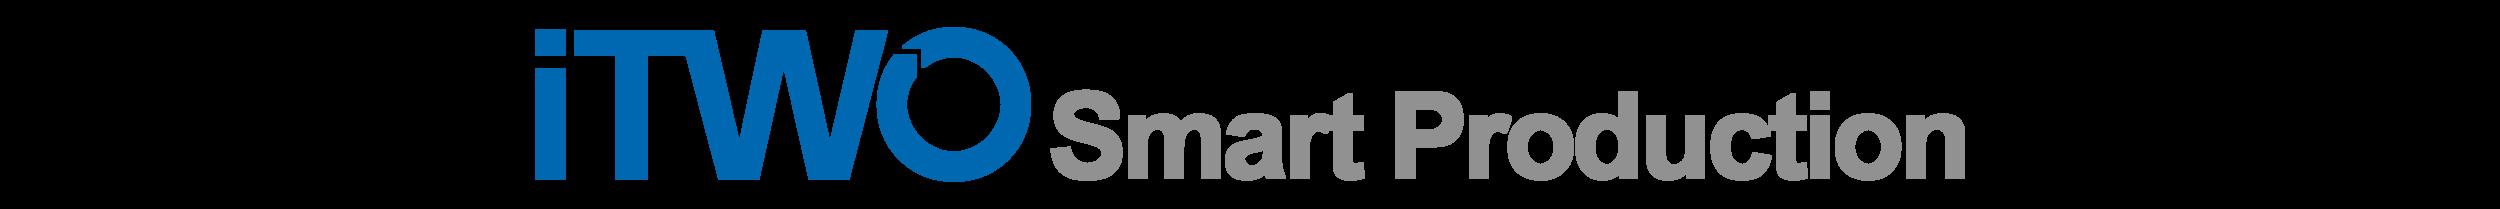 iTWO smart production_Tegnebræt 1.png